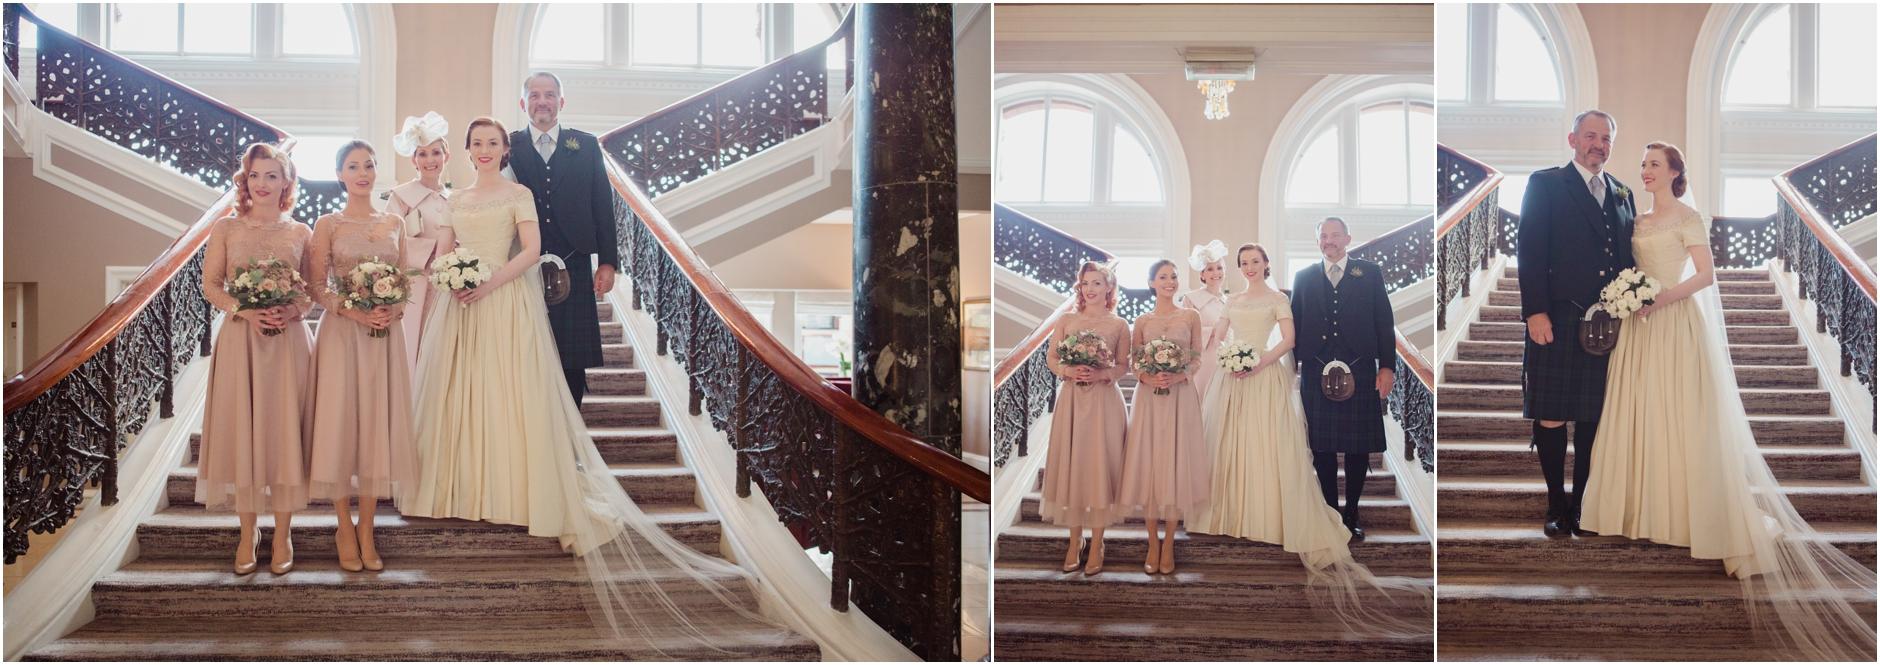 vintage bride wedding edinburgh cannongate kirk royal college of physicians